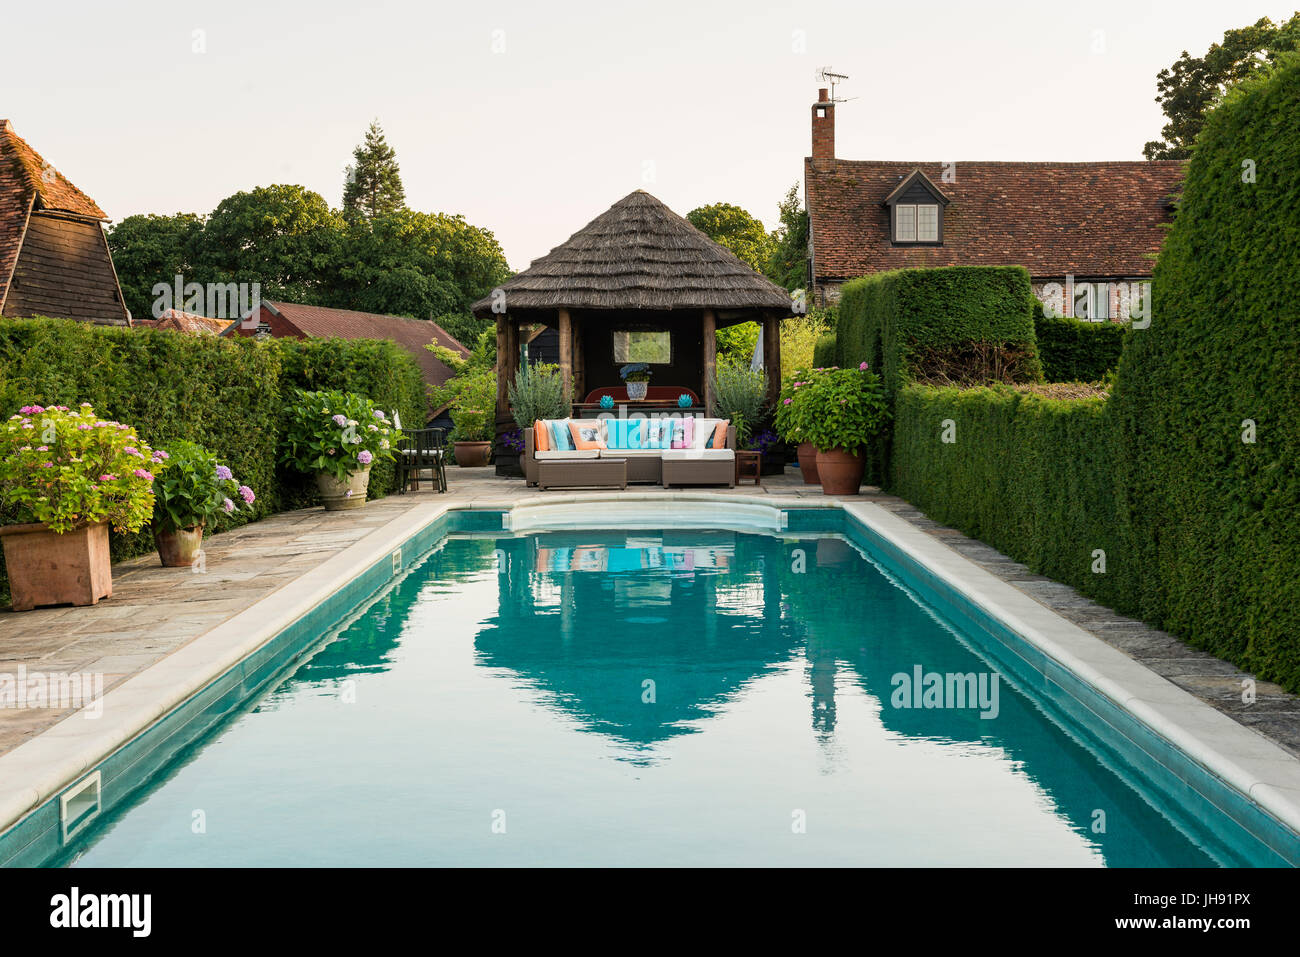 Gazebo by swimming pool Stock Photo: 148331090 - Alamy